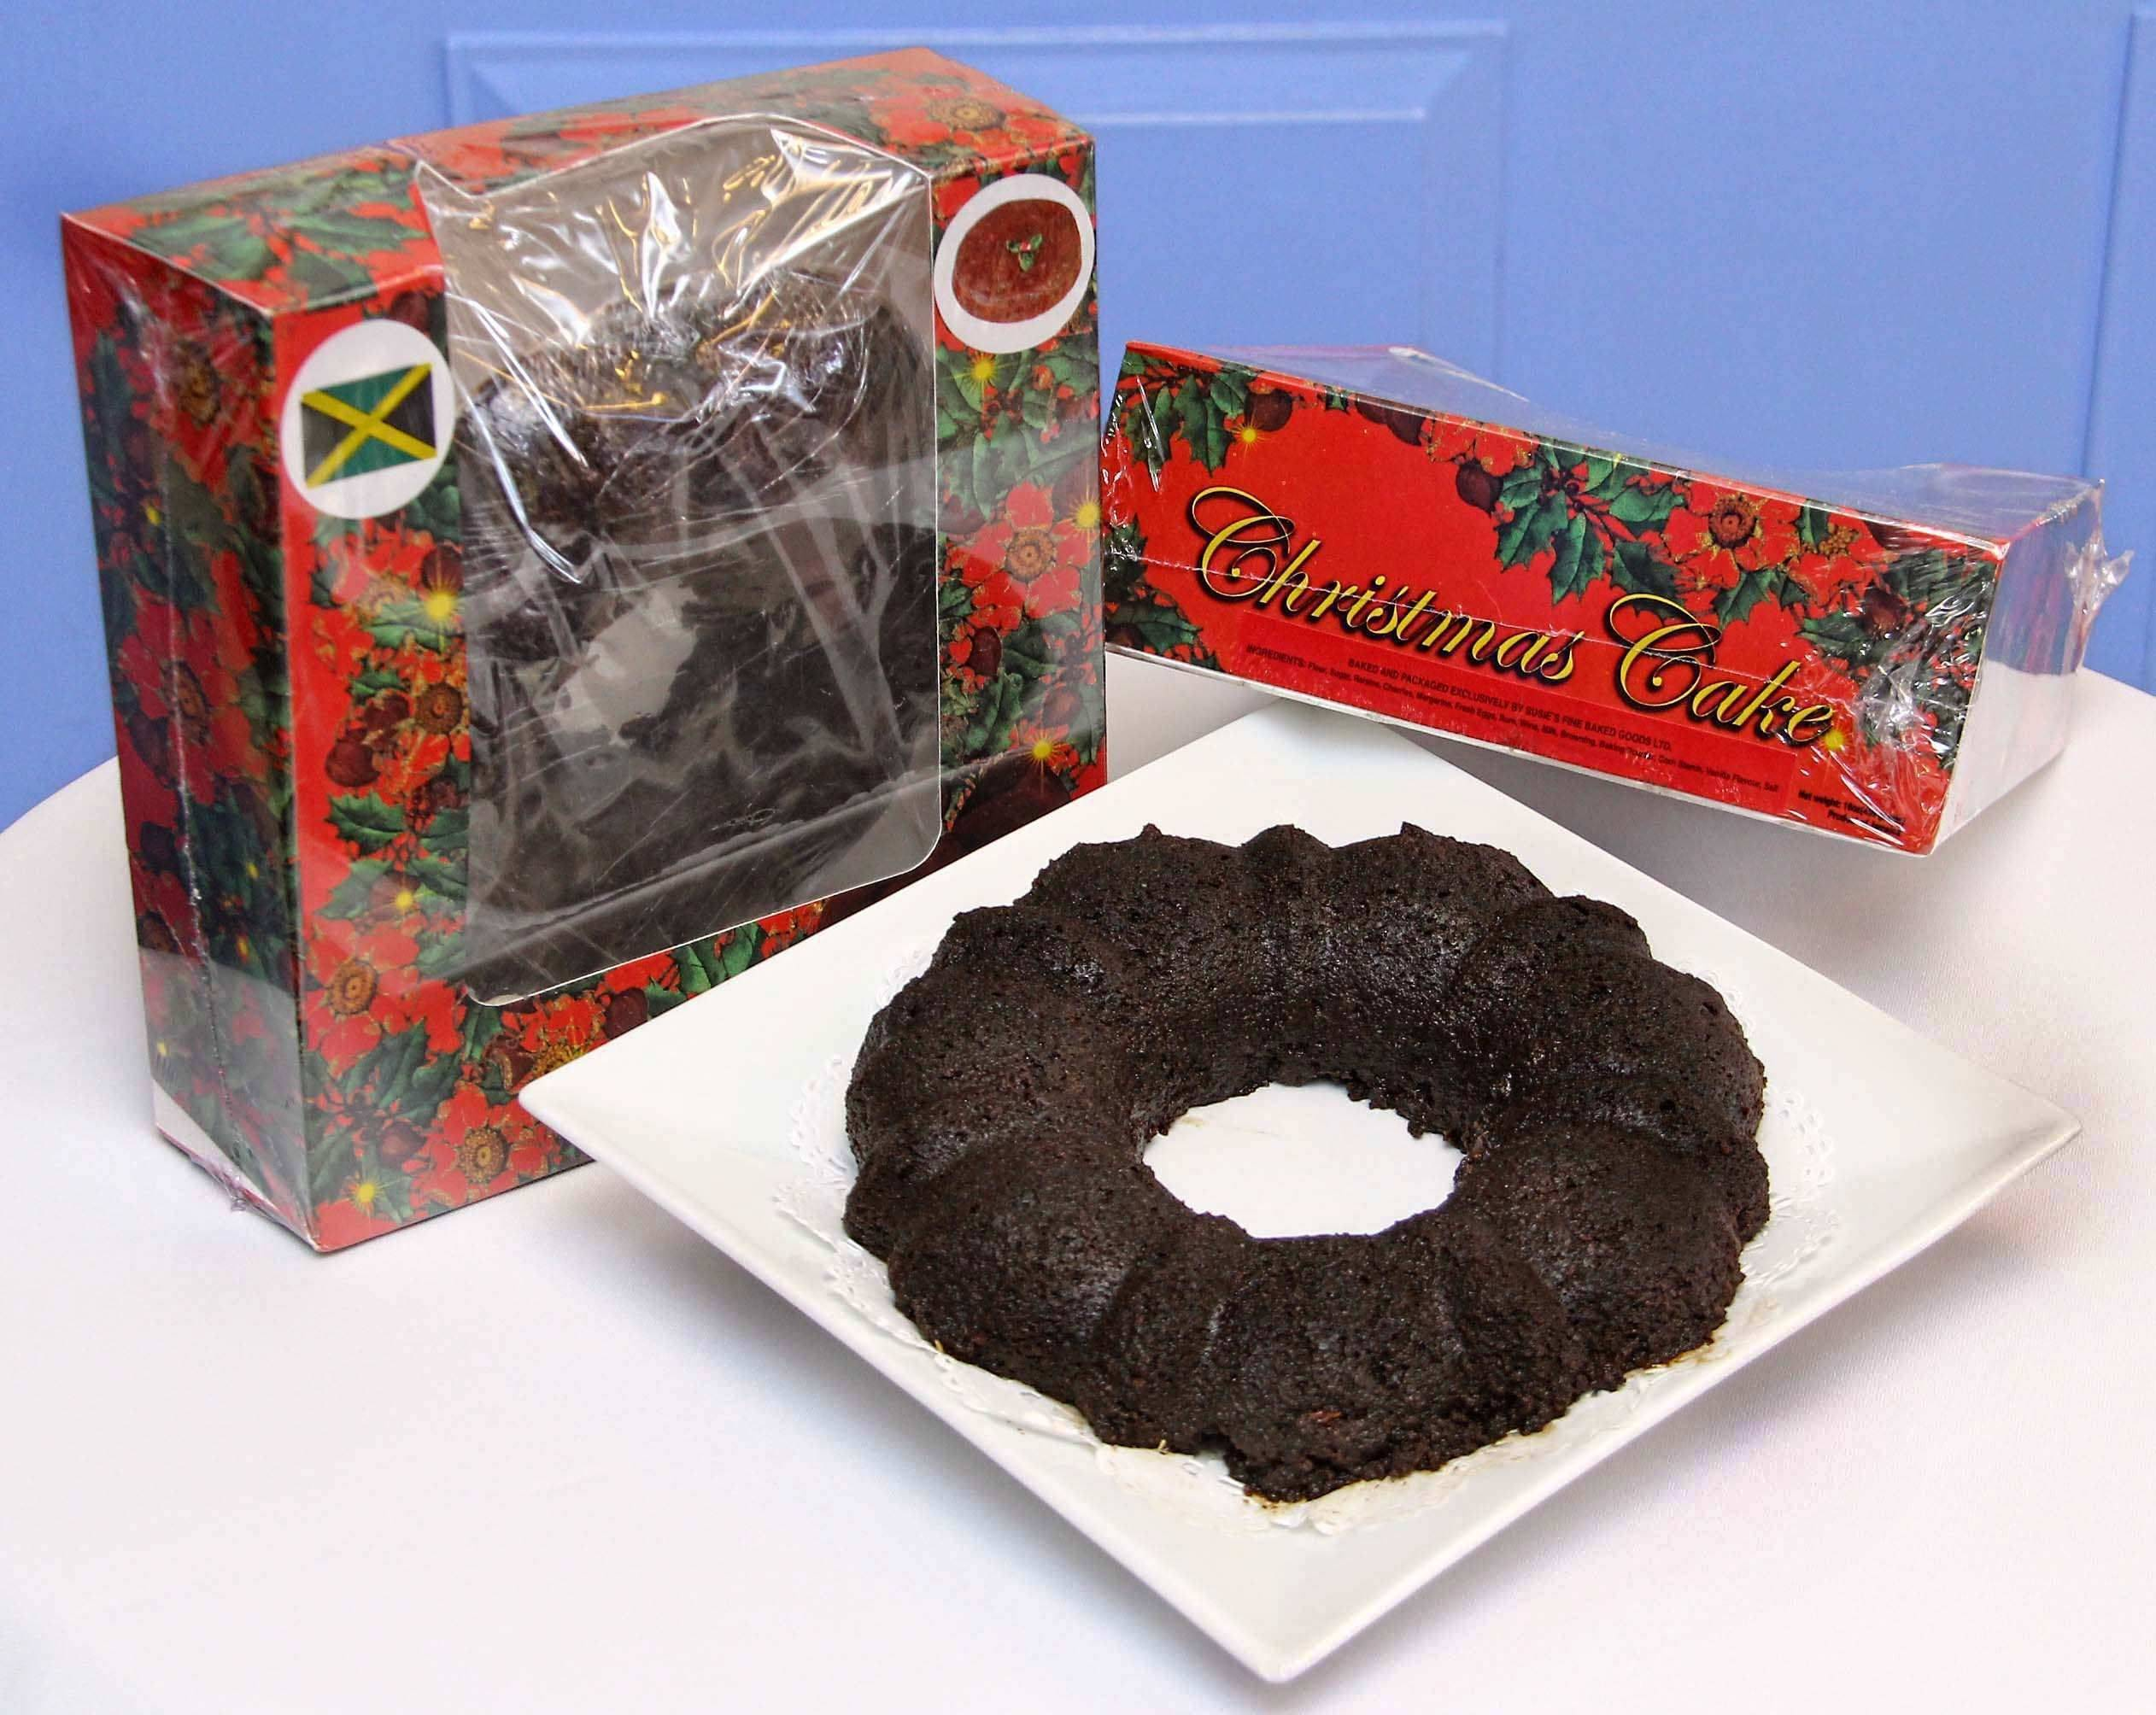 Susie's Fruit Cakes (1 Pound)